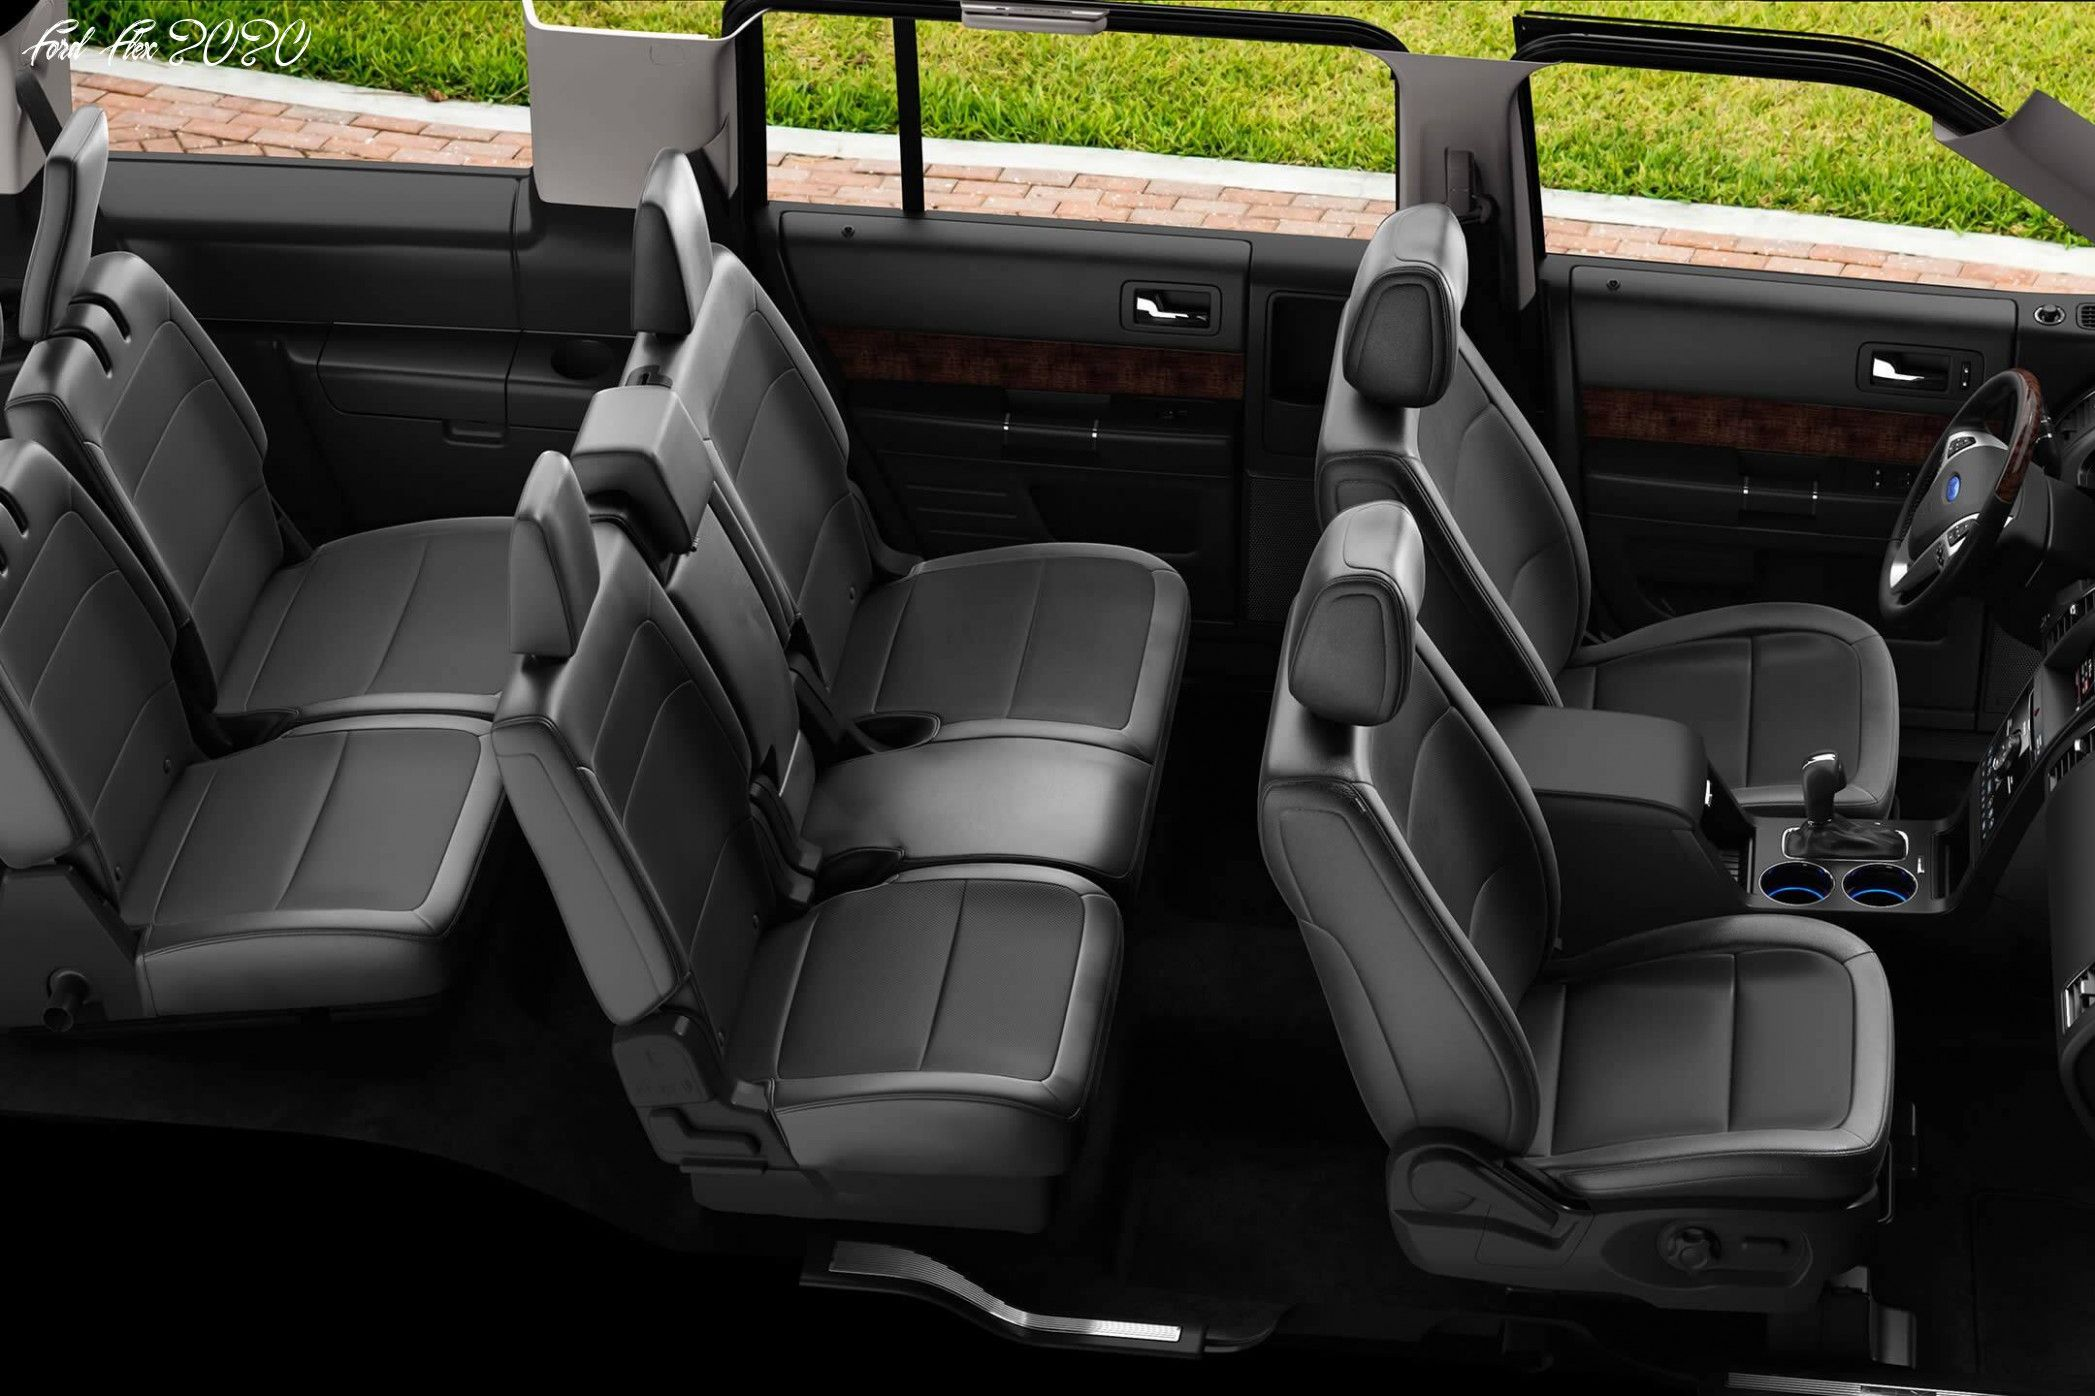 Ford Flex 2020 Prices In 2020 Ford Flex Toyota Racing Development Lexus Sports Car